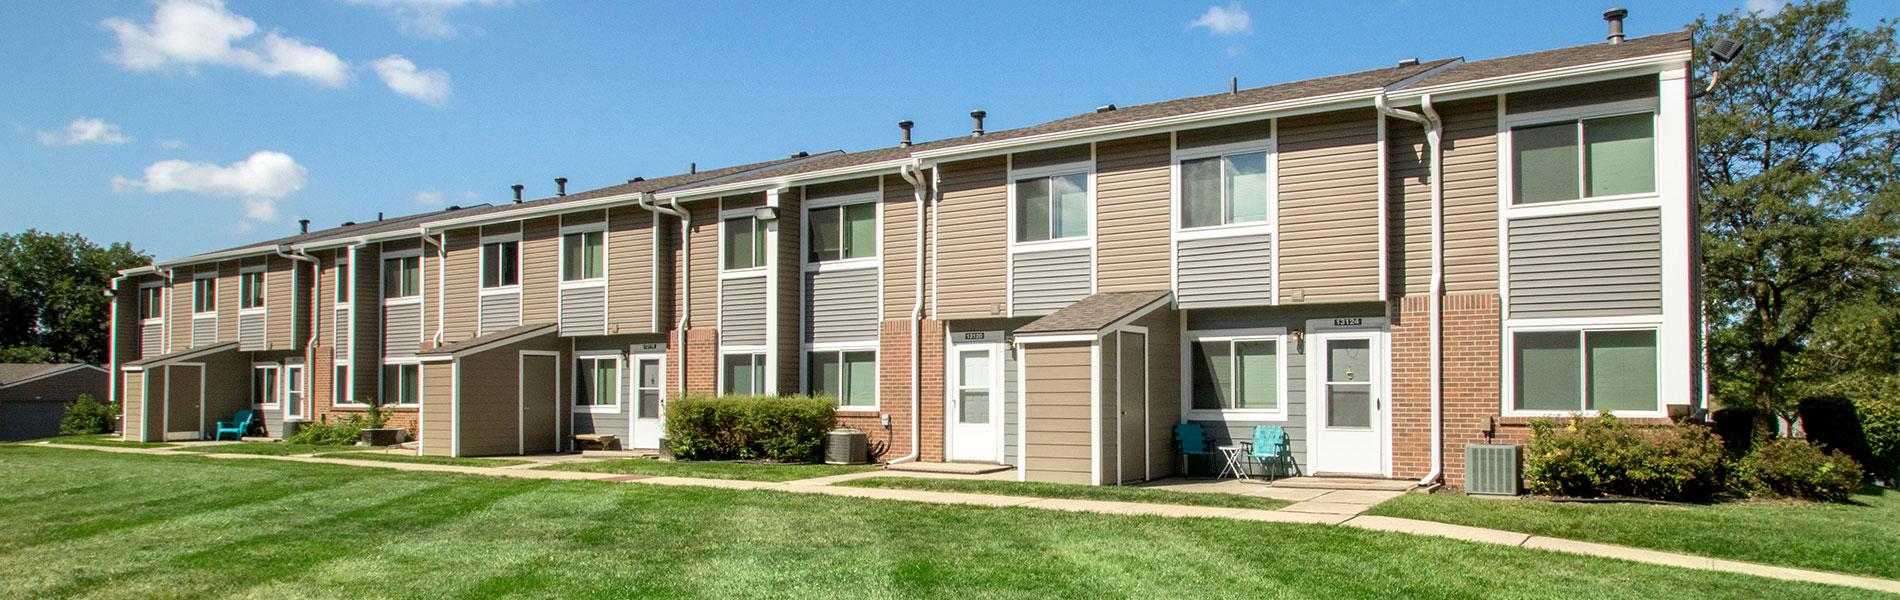 Apartments In Omaha, NE   Sunset Ridge Apartment Homes In Omaha, NE